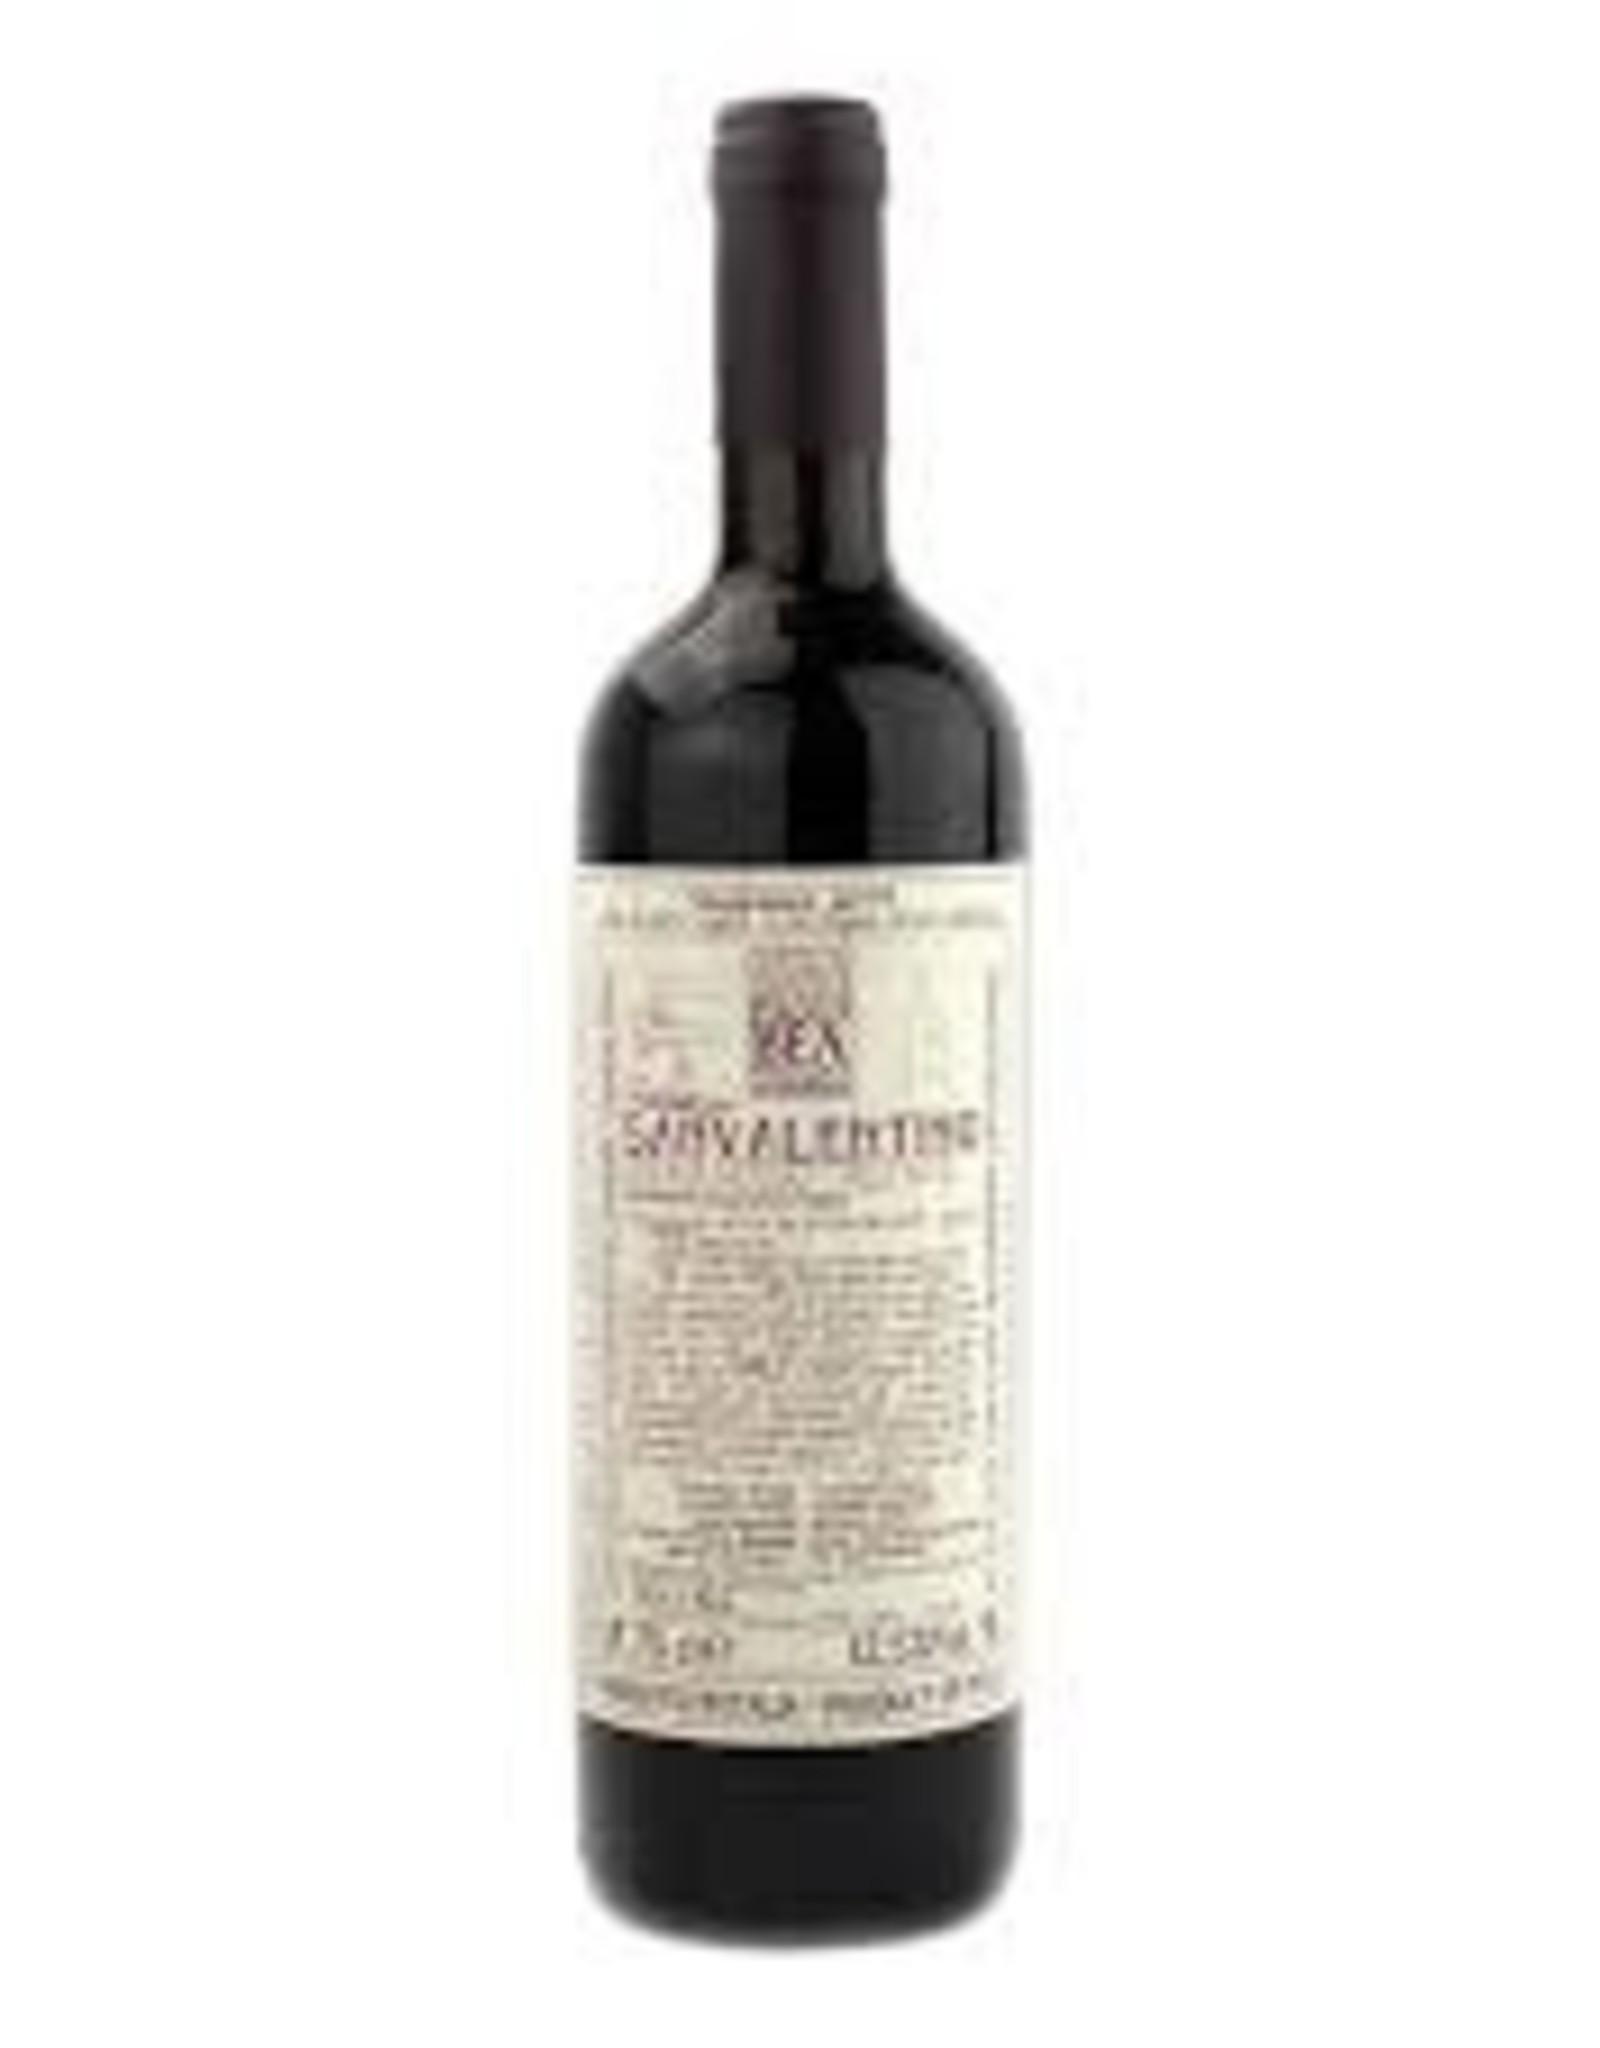 Wine - RED Umbria Rosso, SAN VALENTINO Montefalco, Paolo Bea 2015